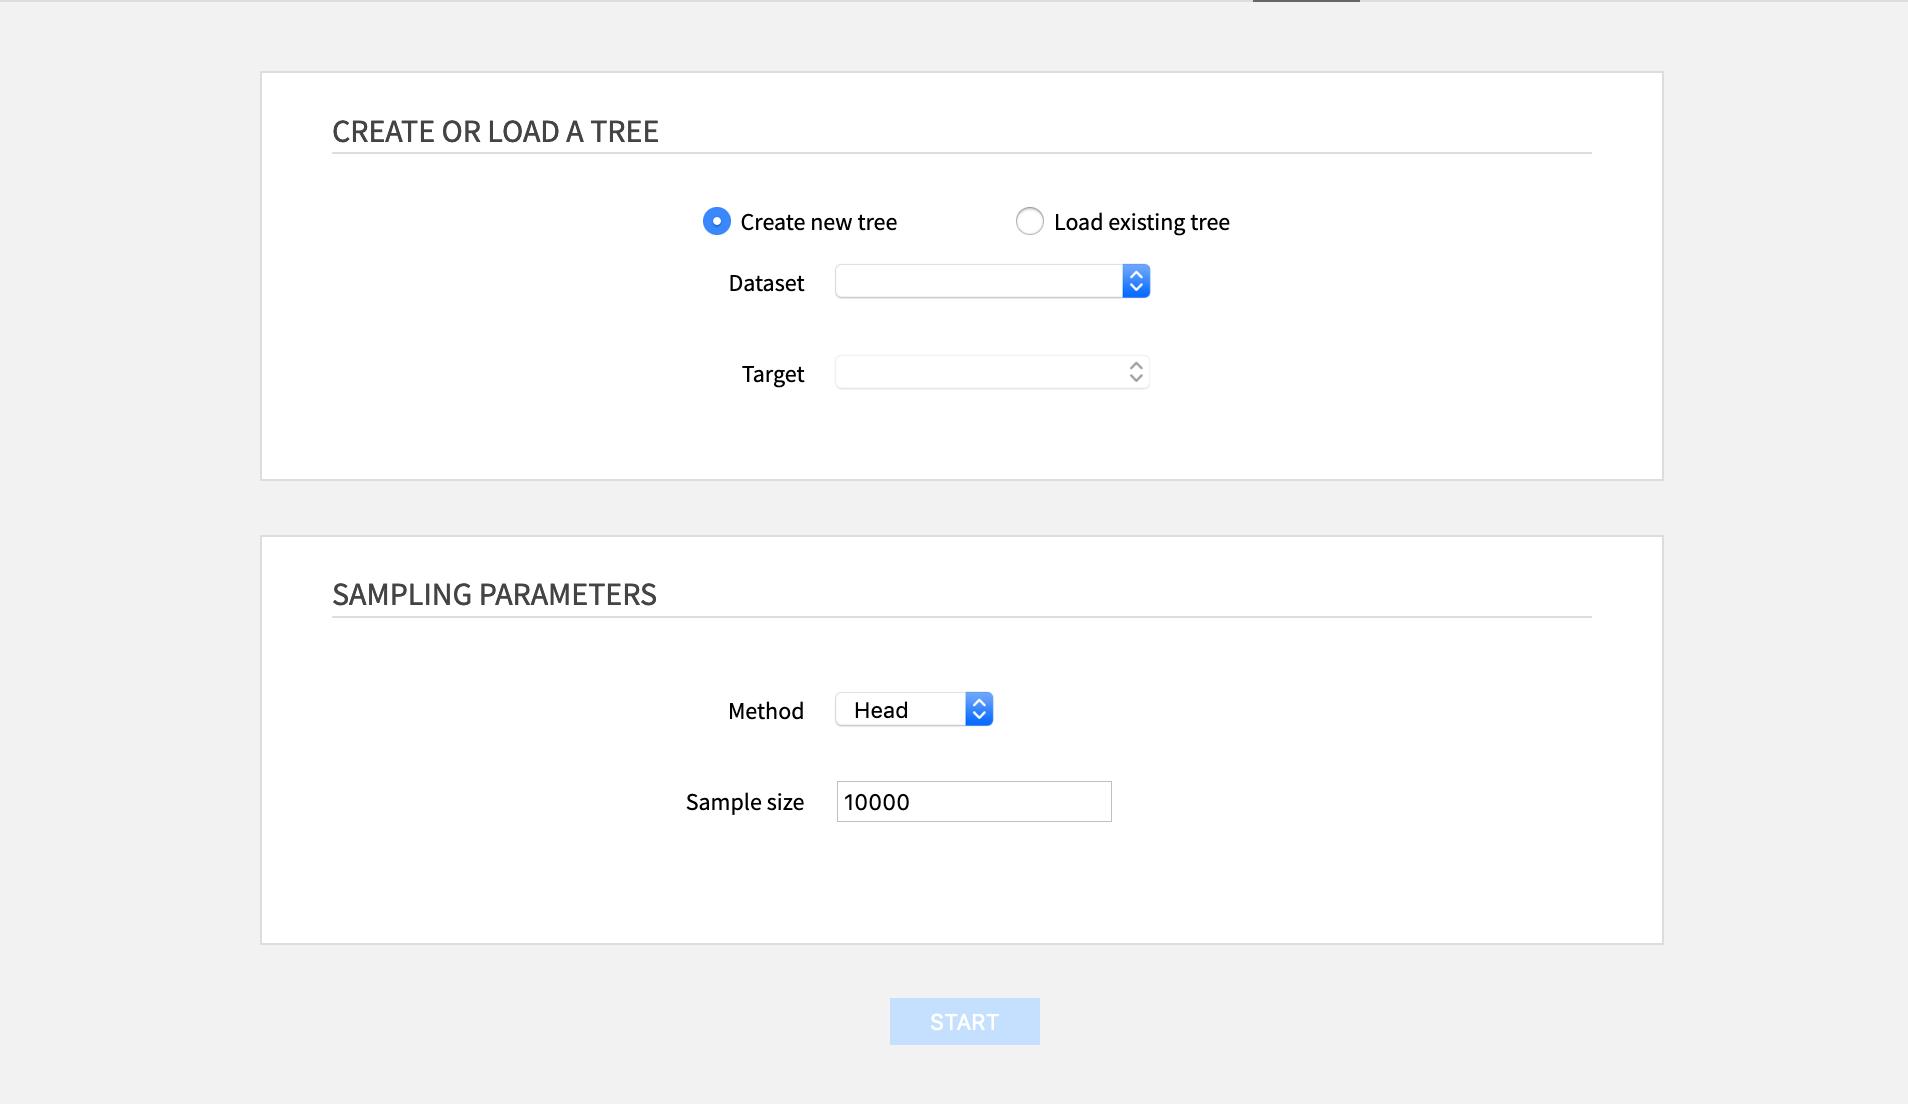 Create or load a tree